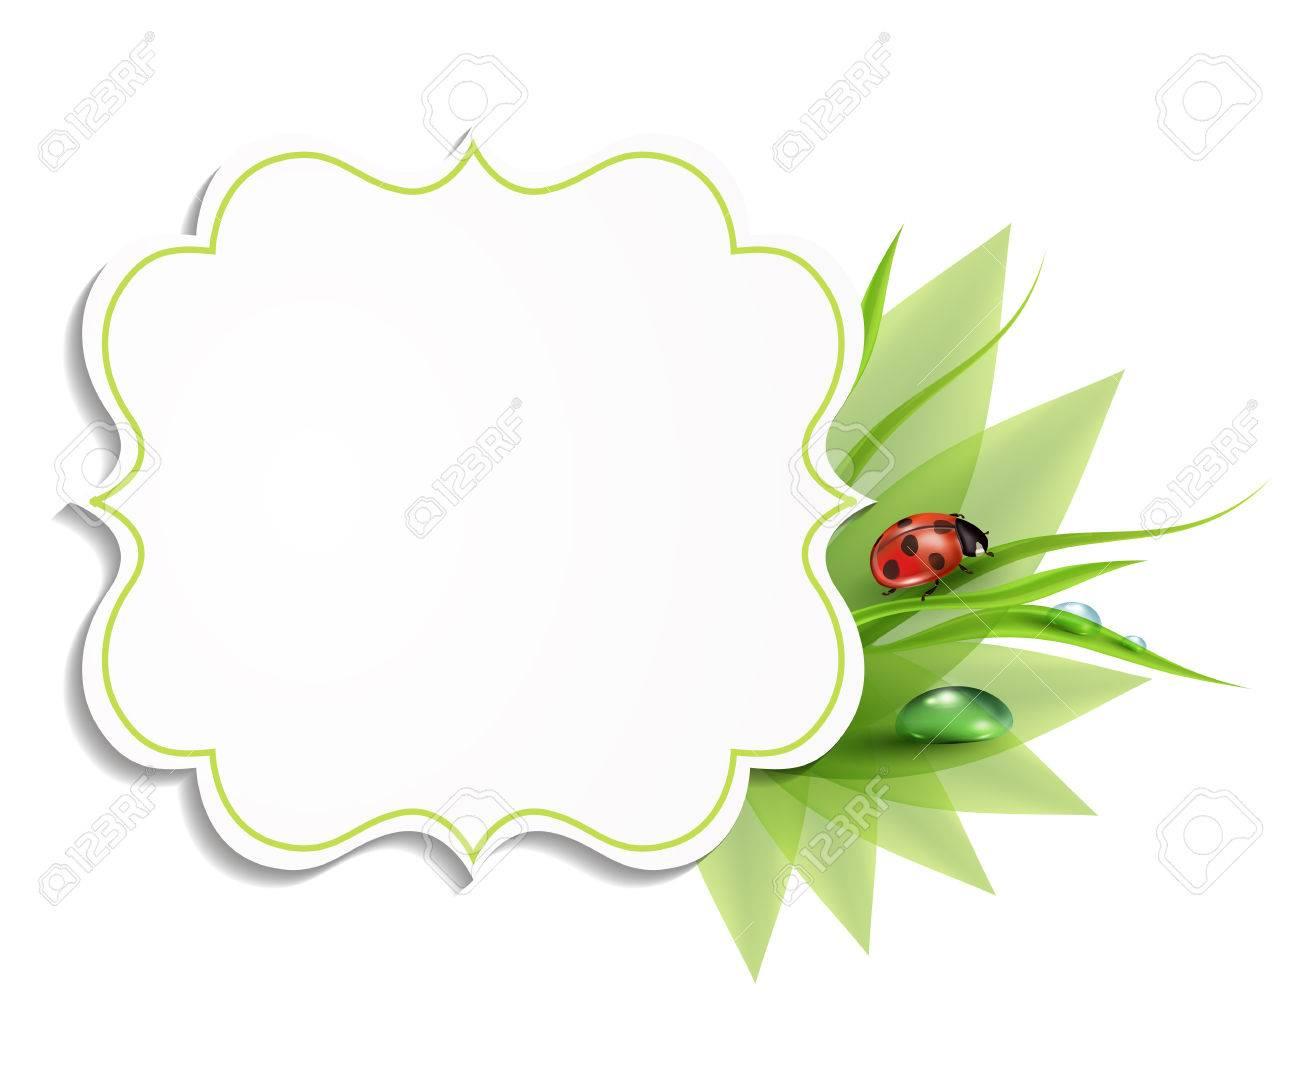 Paper origami fresh grass banner stock vector illustration of.